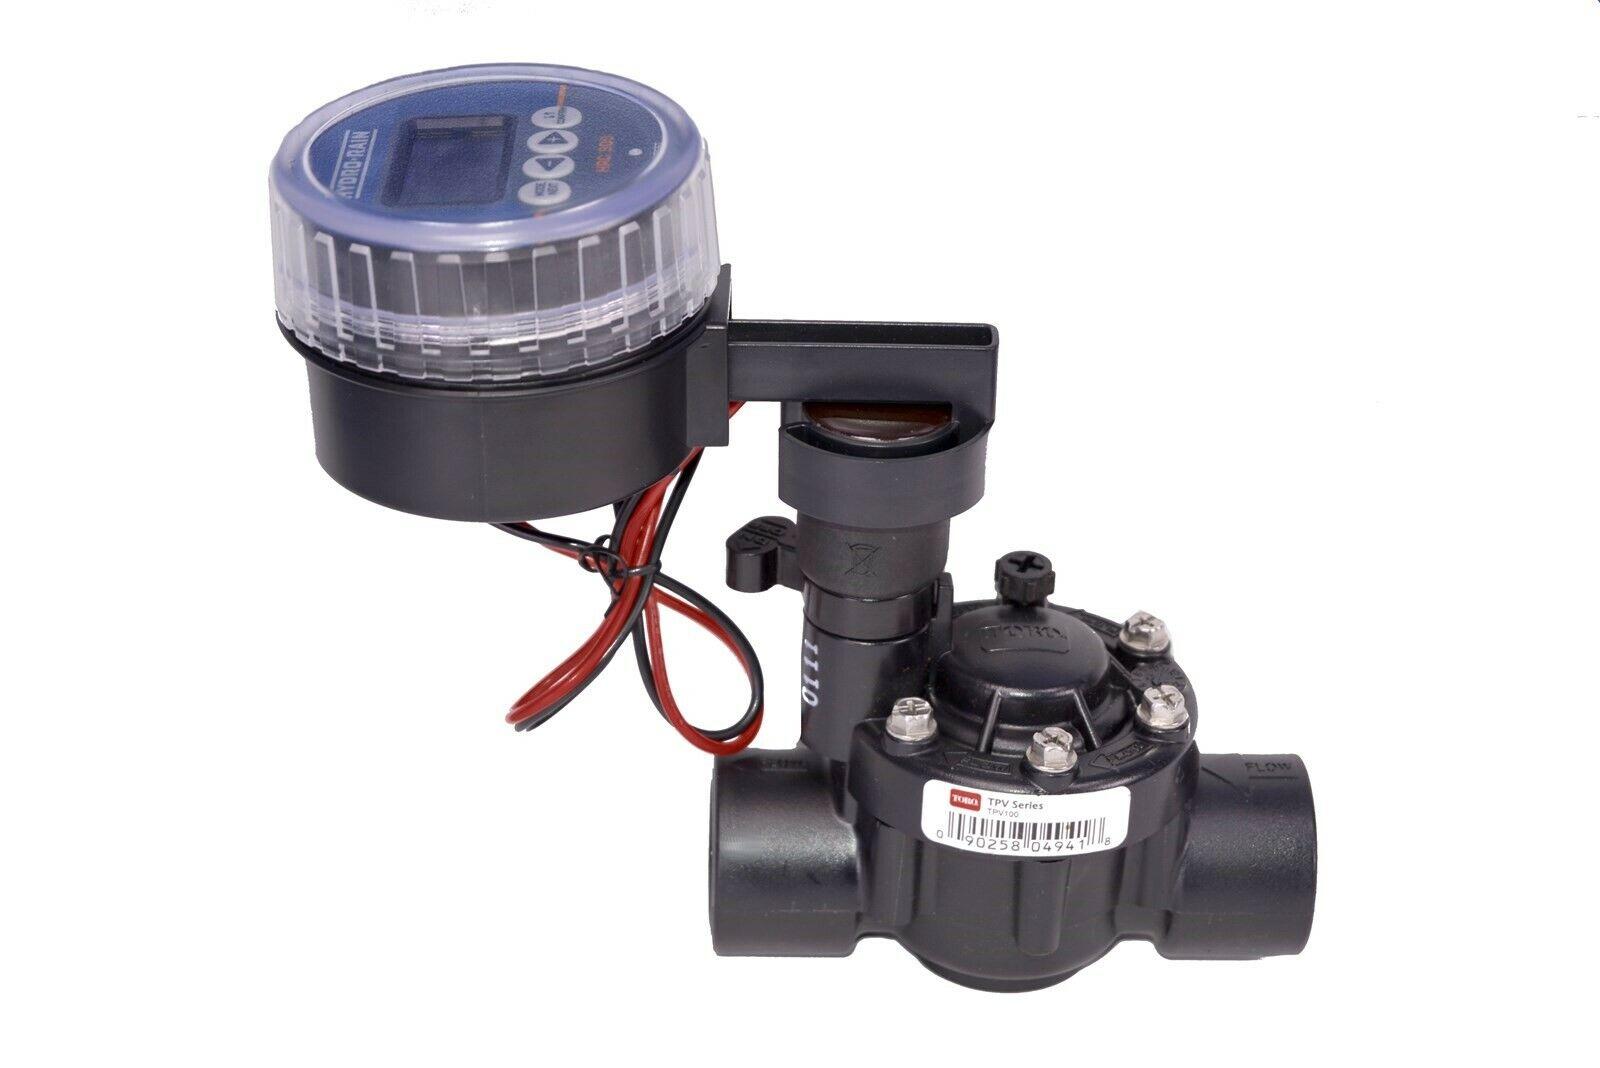 Toro Battery Operated Sprinkler Timer Bundle w/ TPV100 Valve & Hydro Rain HRC900